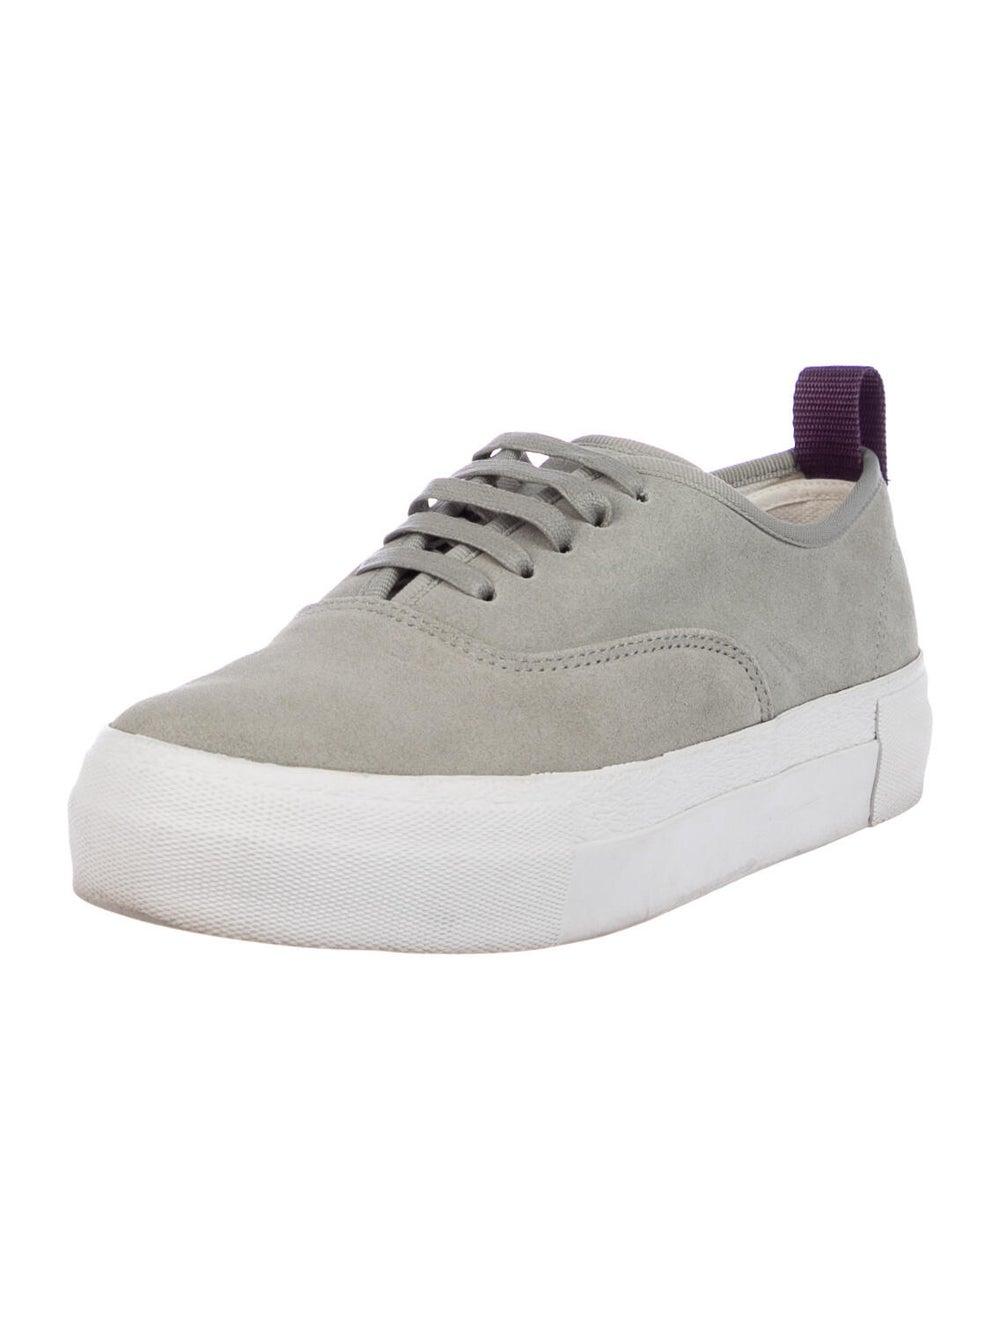 Eytys Suede Sneakers Green - image 2